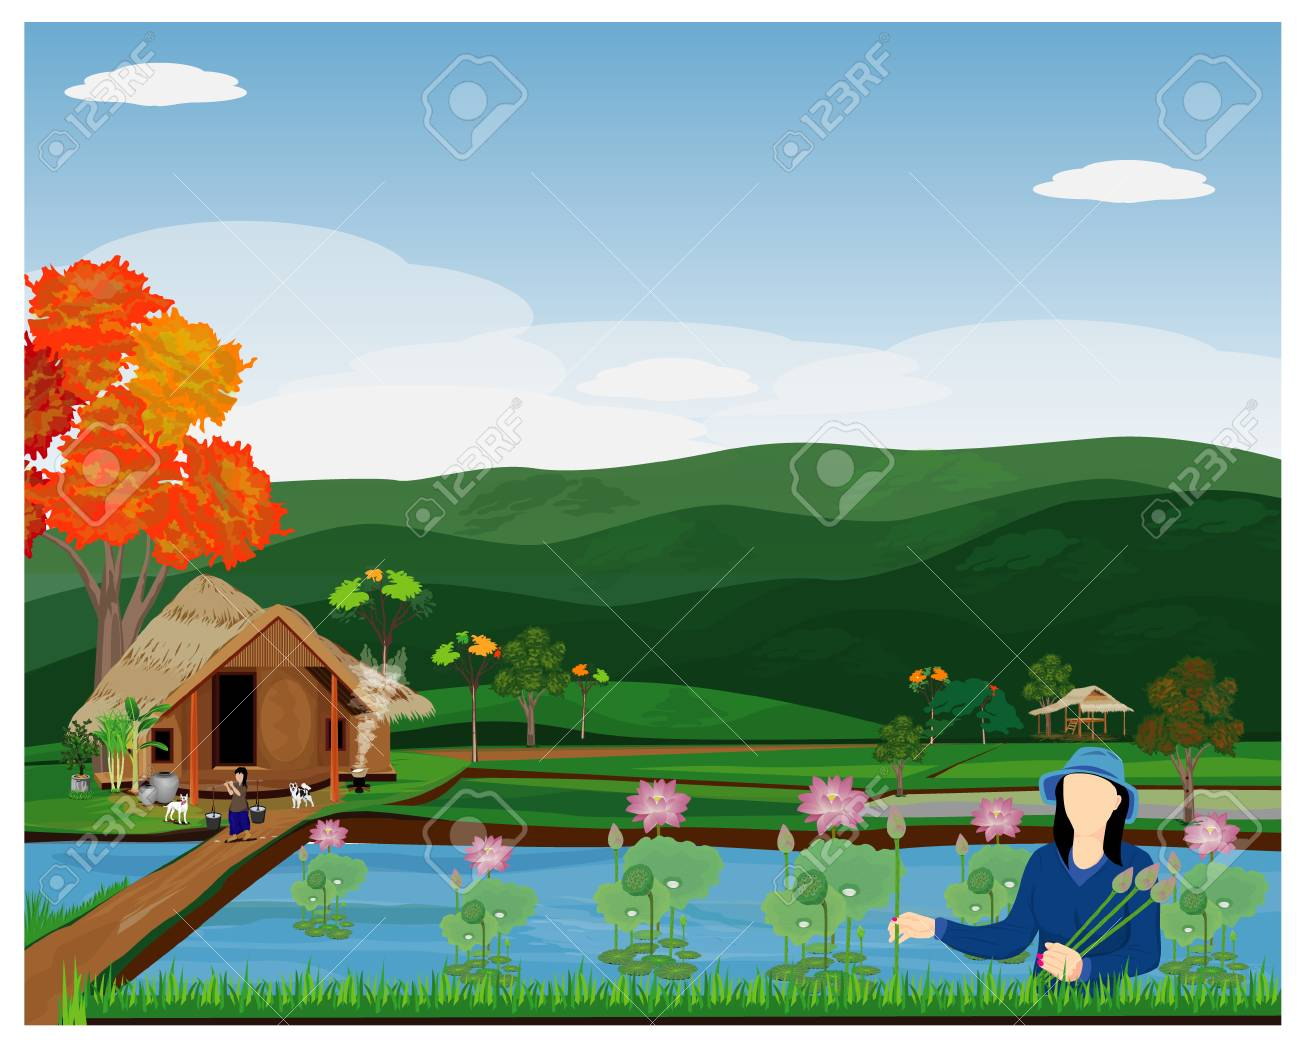 Marigold Flower Stock Illustrations – 3,418 Marigold Flower Stock  Illustrations, Vectors & Clipart - Dreamstime